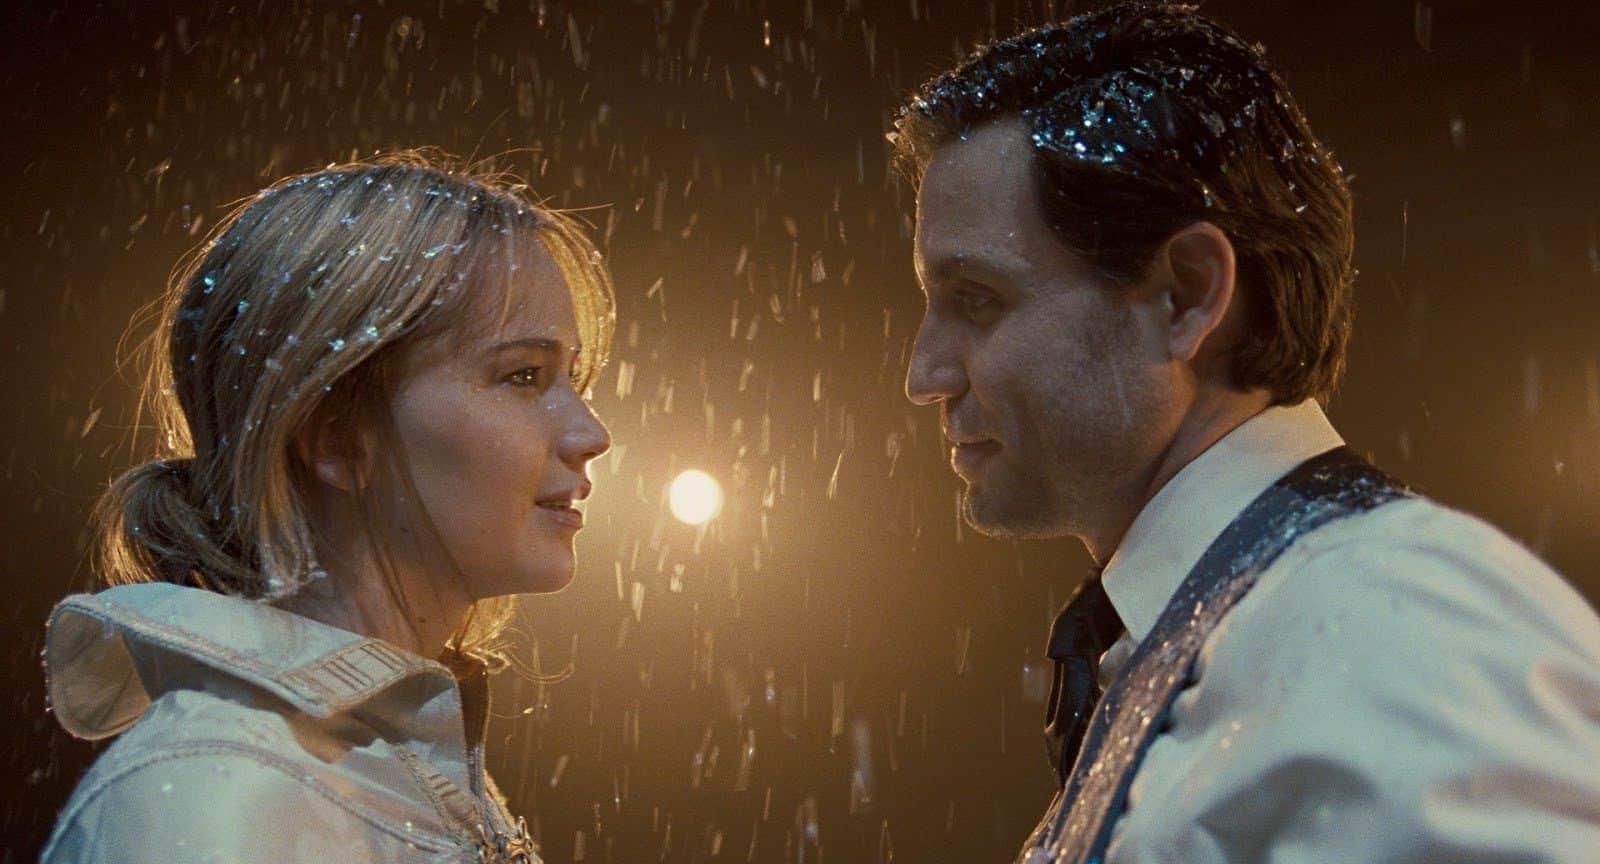 joy-movie-review-by-matthew-luke-brady-771916